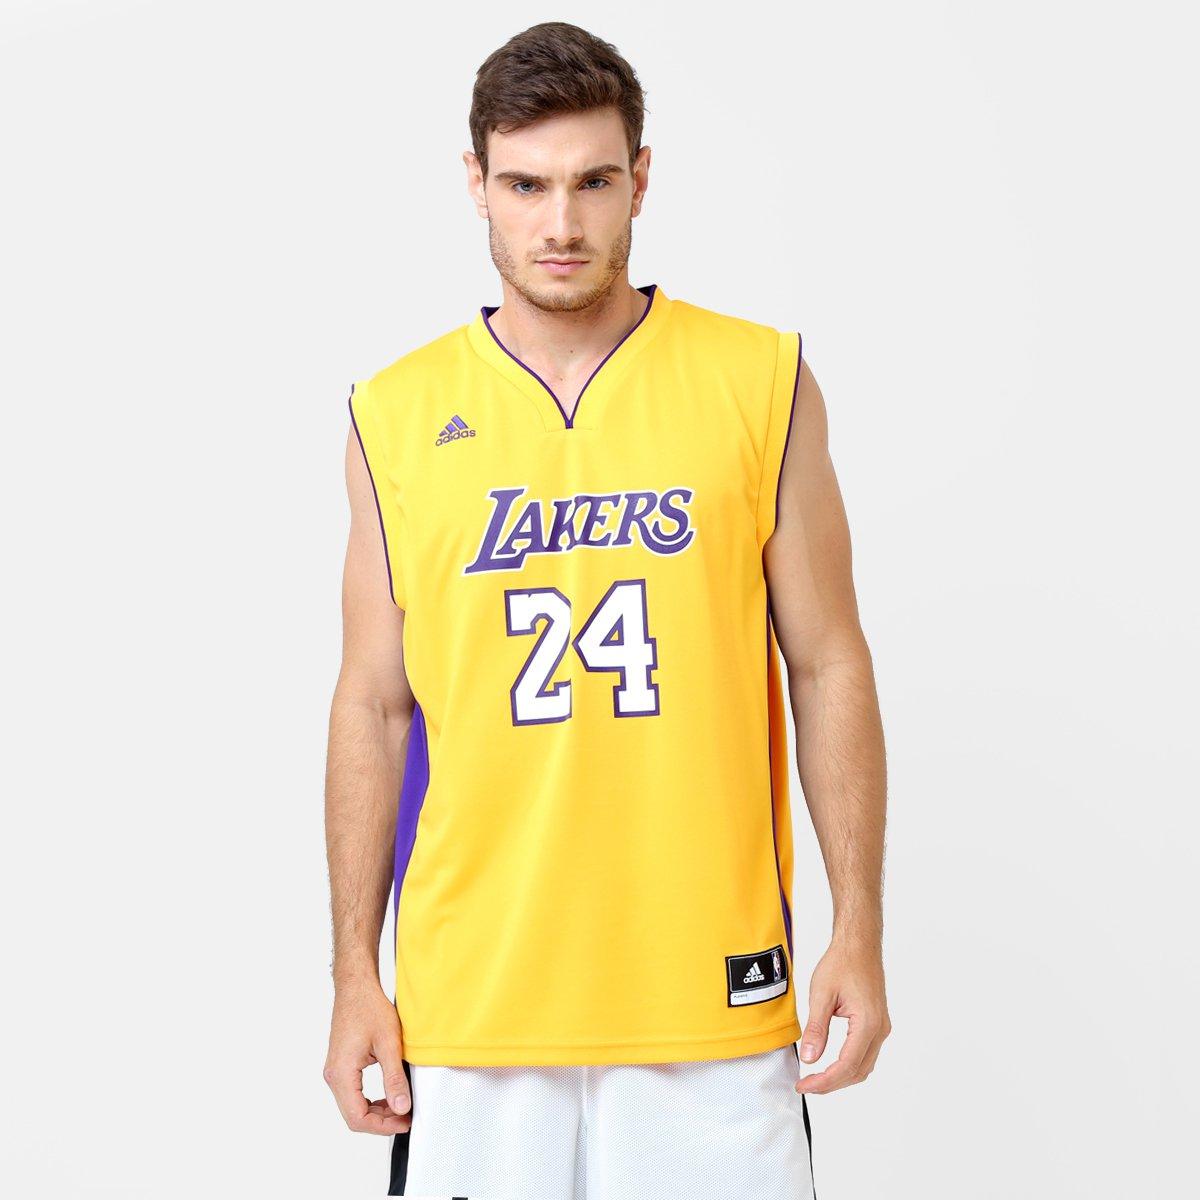 Camiseta Regata NBA Adidas Los Angeles Lakers Home - Bryant - Compre Agora   b04ab97bd2f